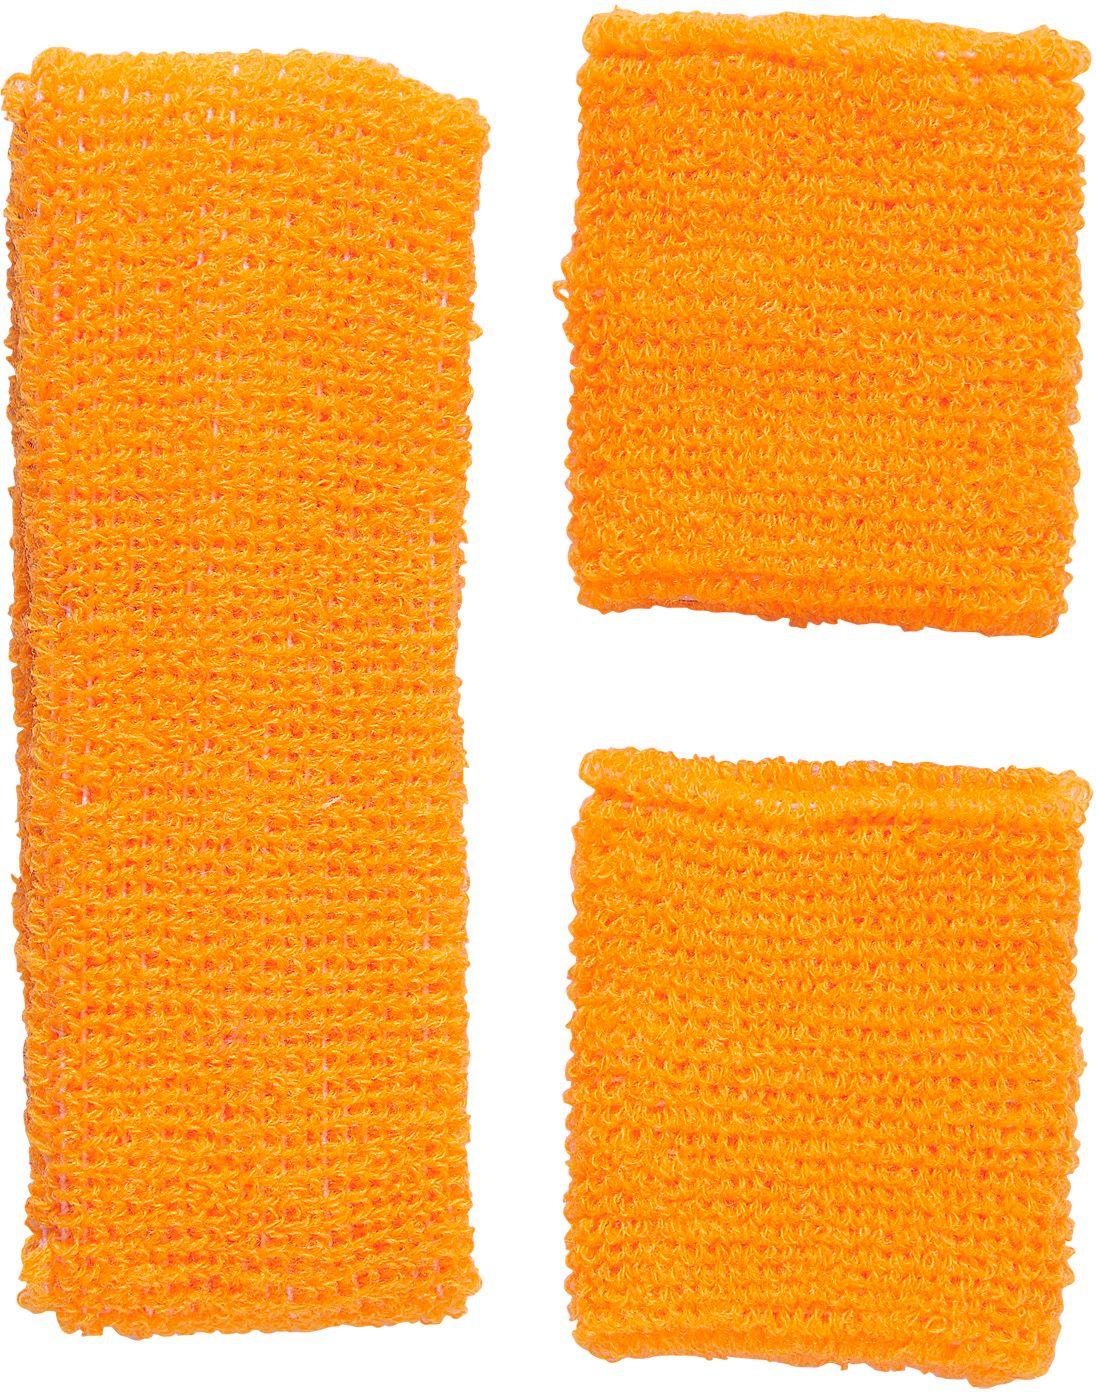 Neon oranje zweetbandjes set